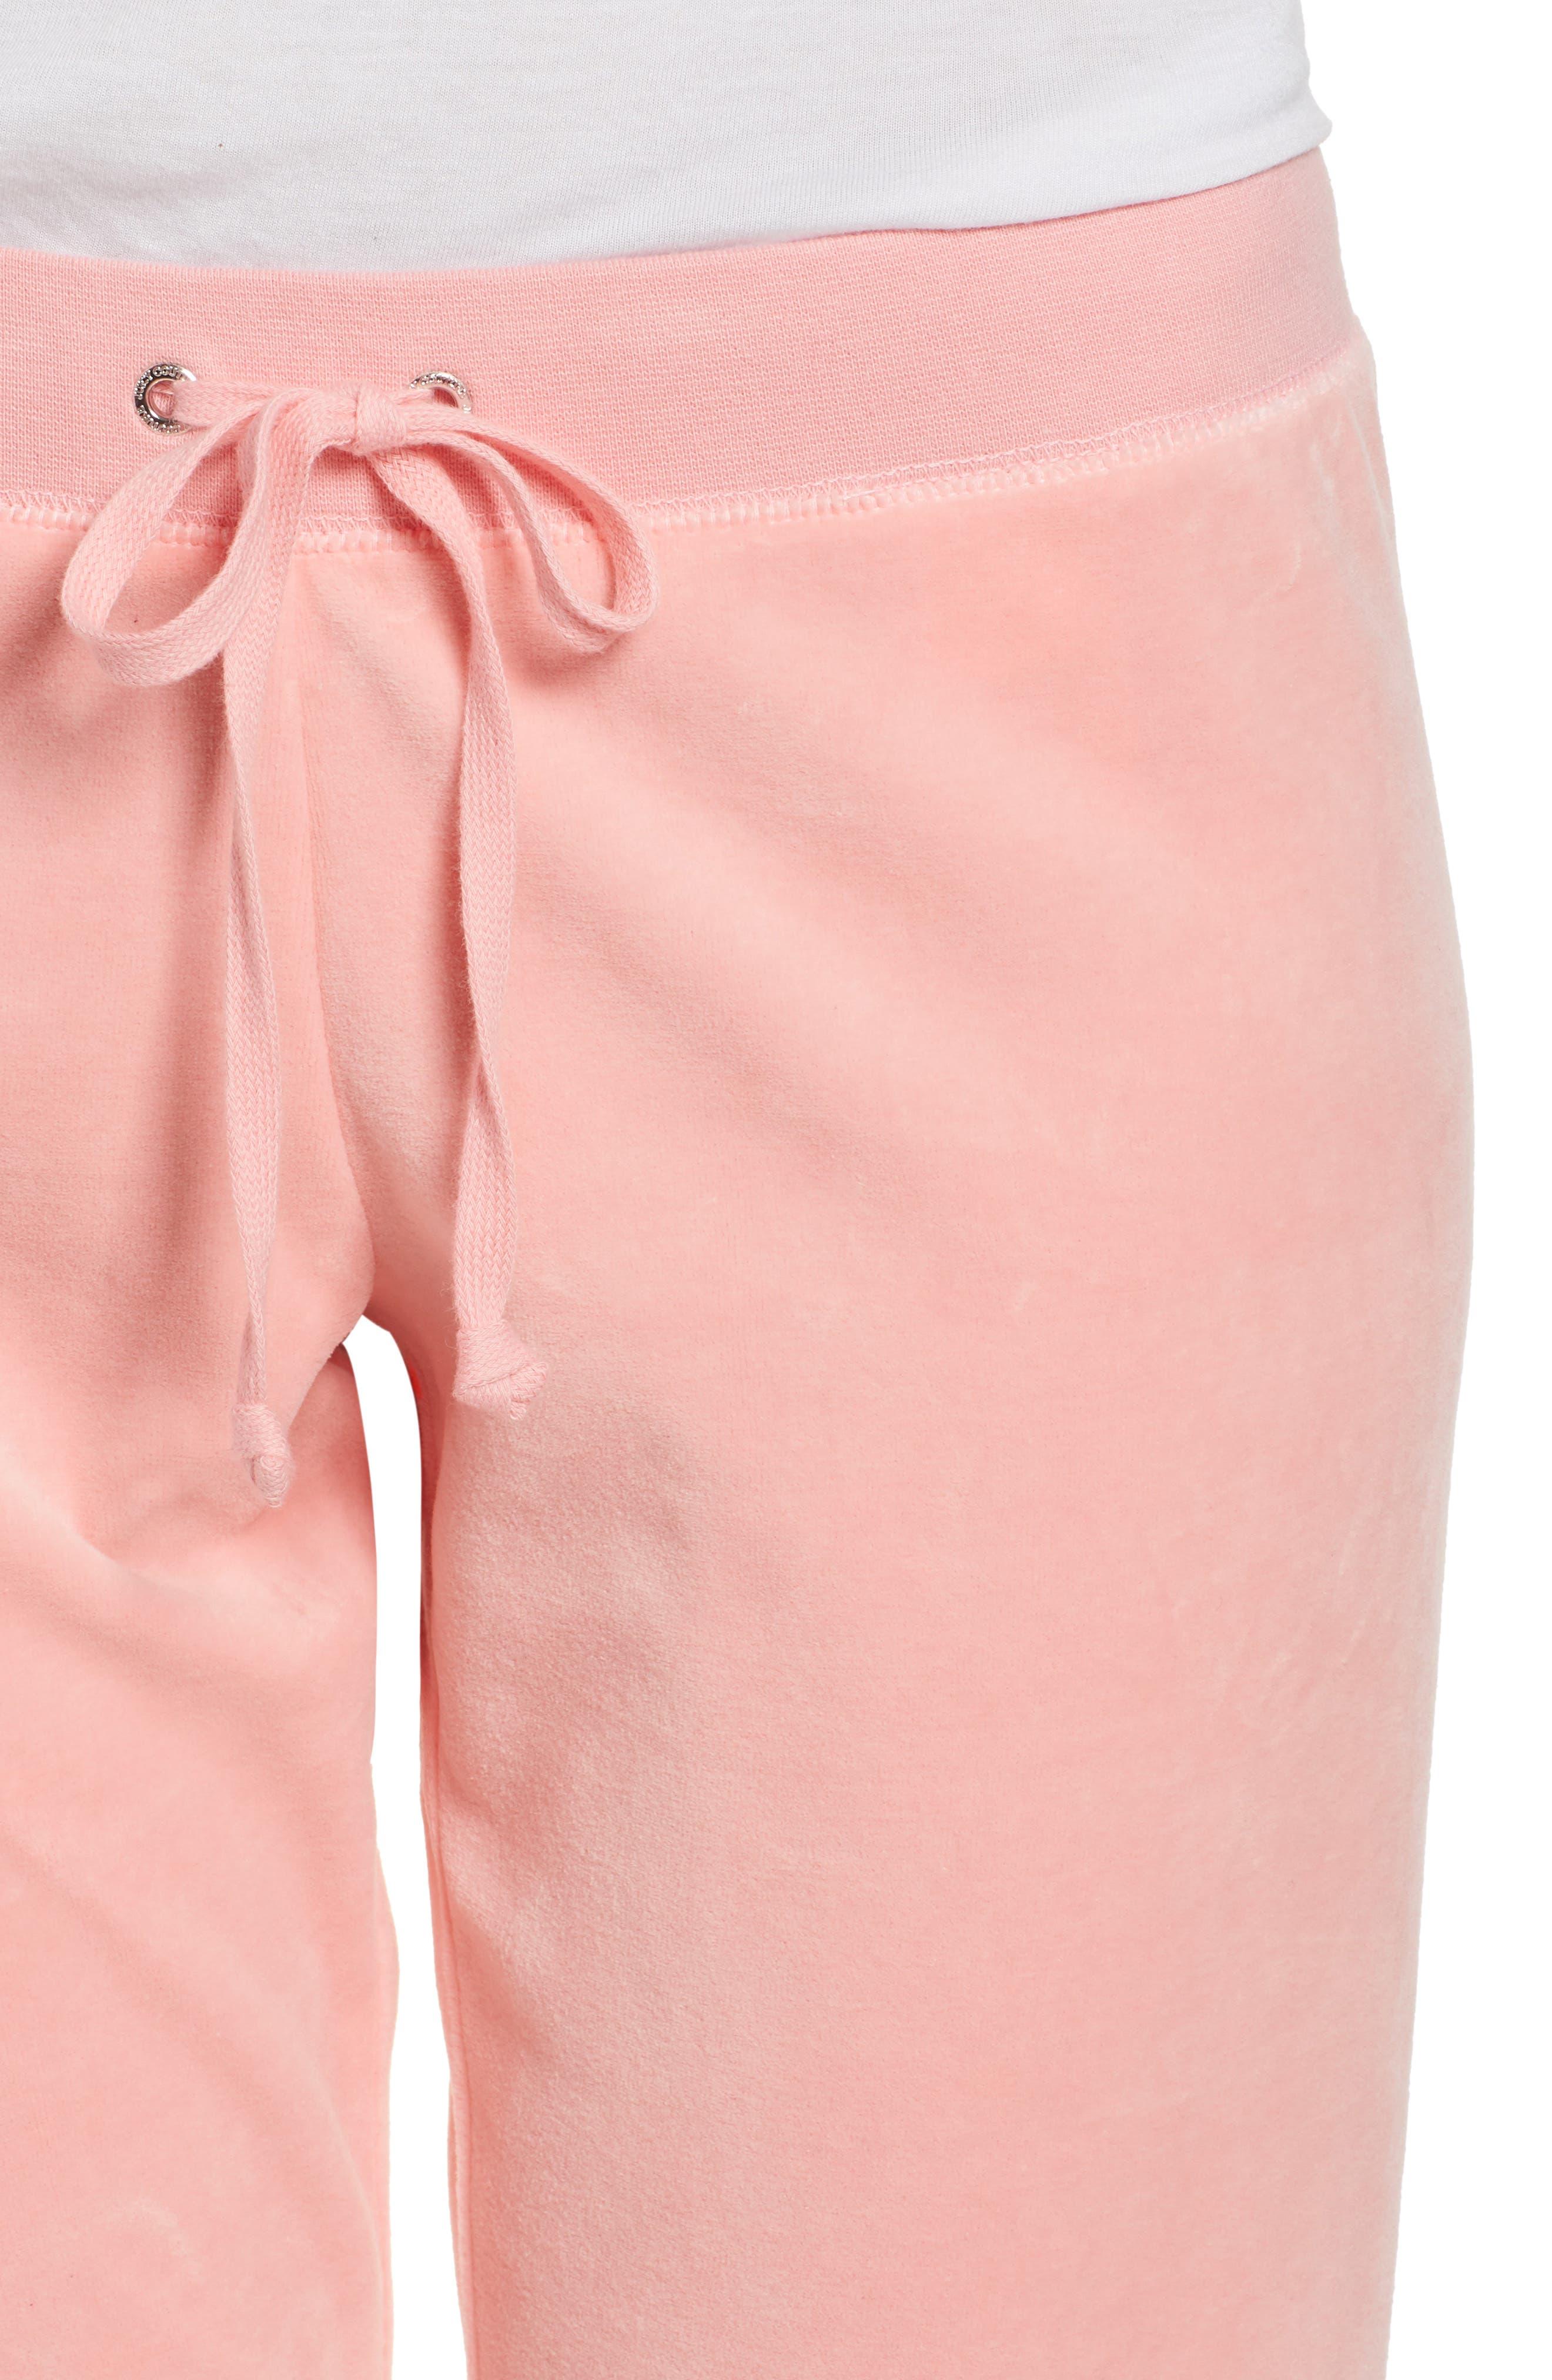 Zuma Velour Track Pants,                             Alternate thumbnail 4, color,                             Sorbet Pink